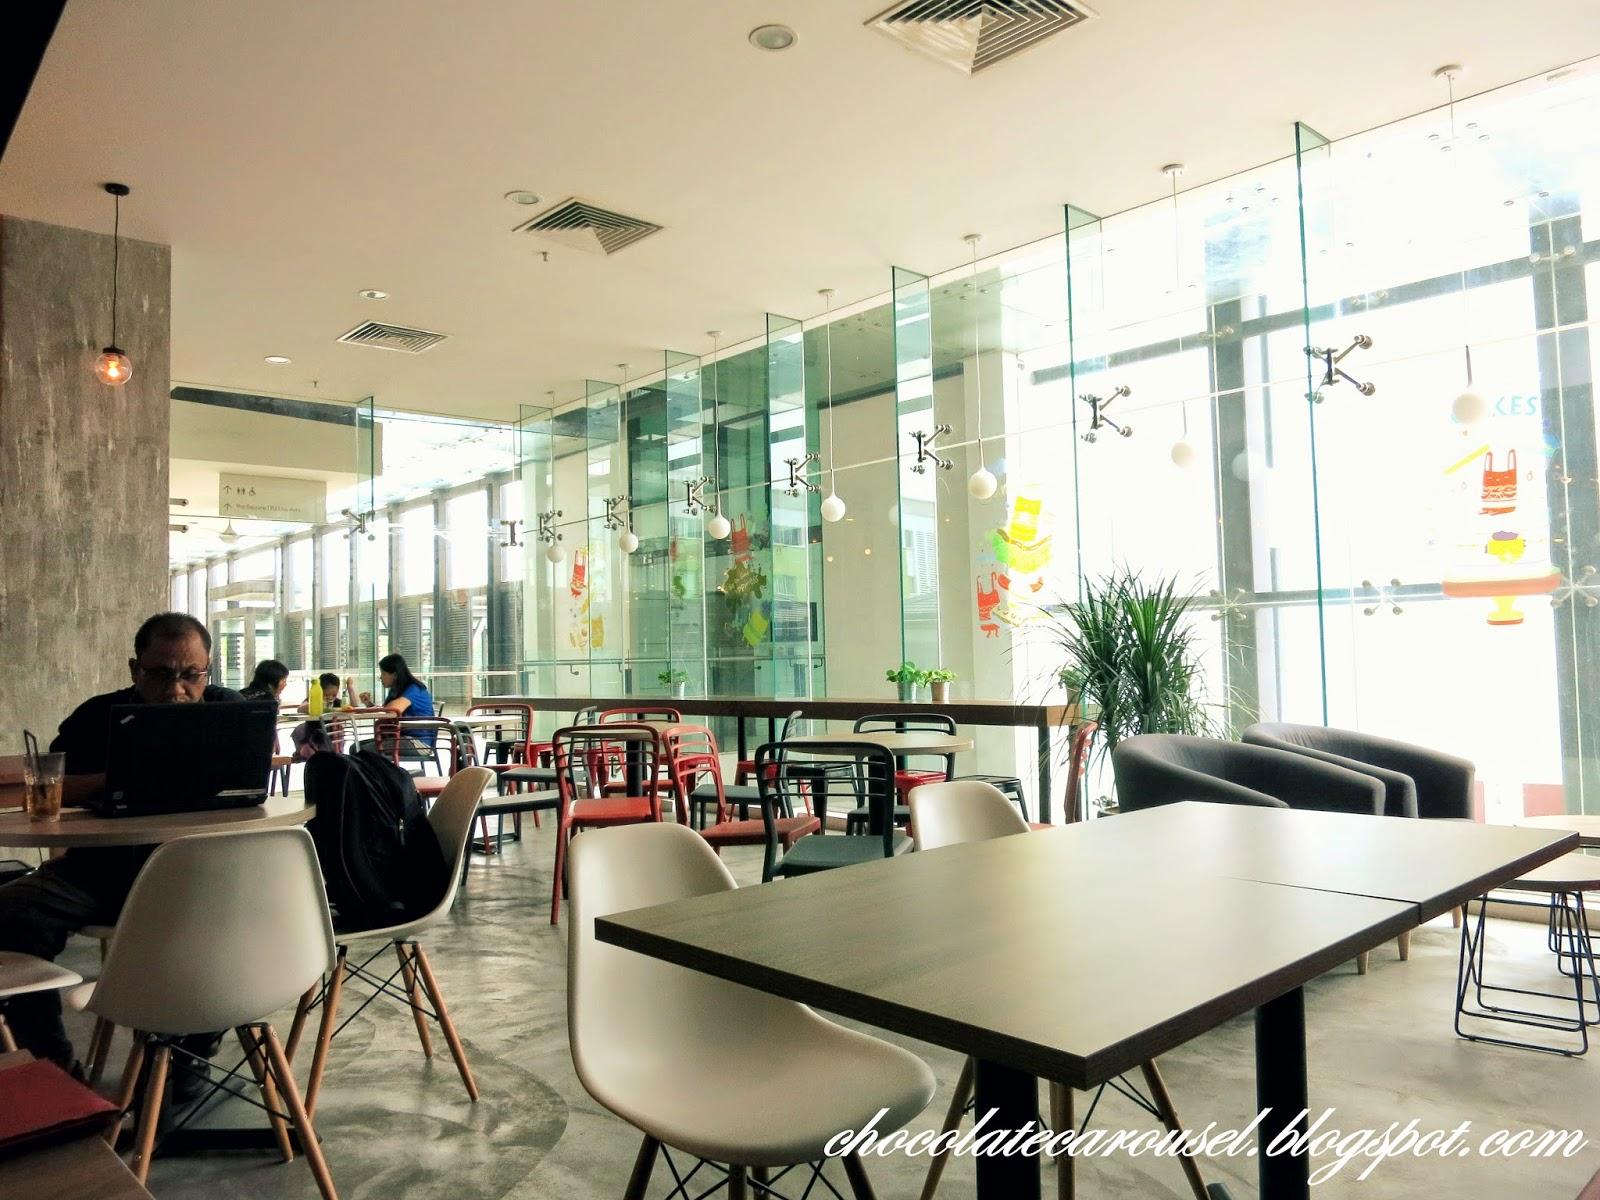 chocolatecarousel.blogspot: food review: fuwa fuwa bakery cafe